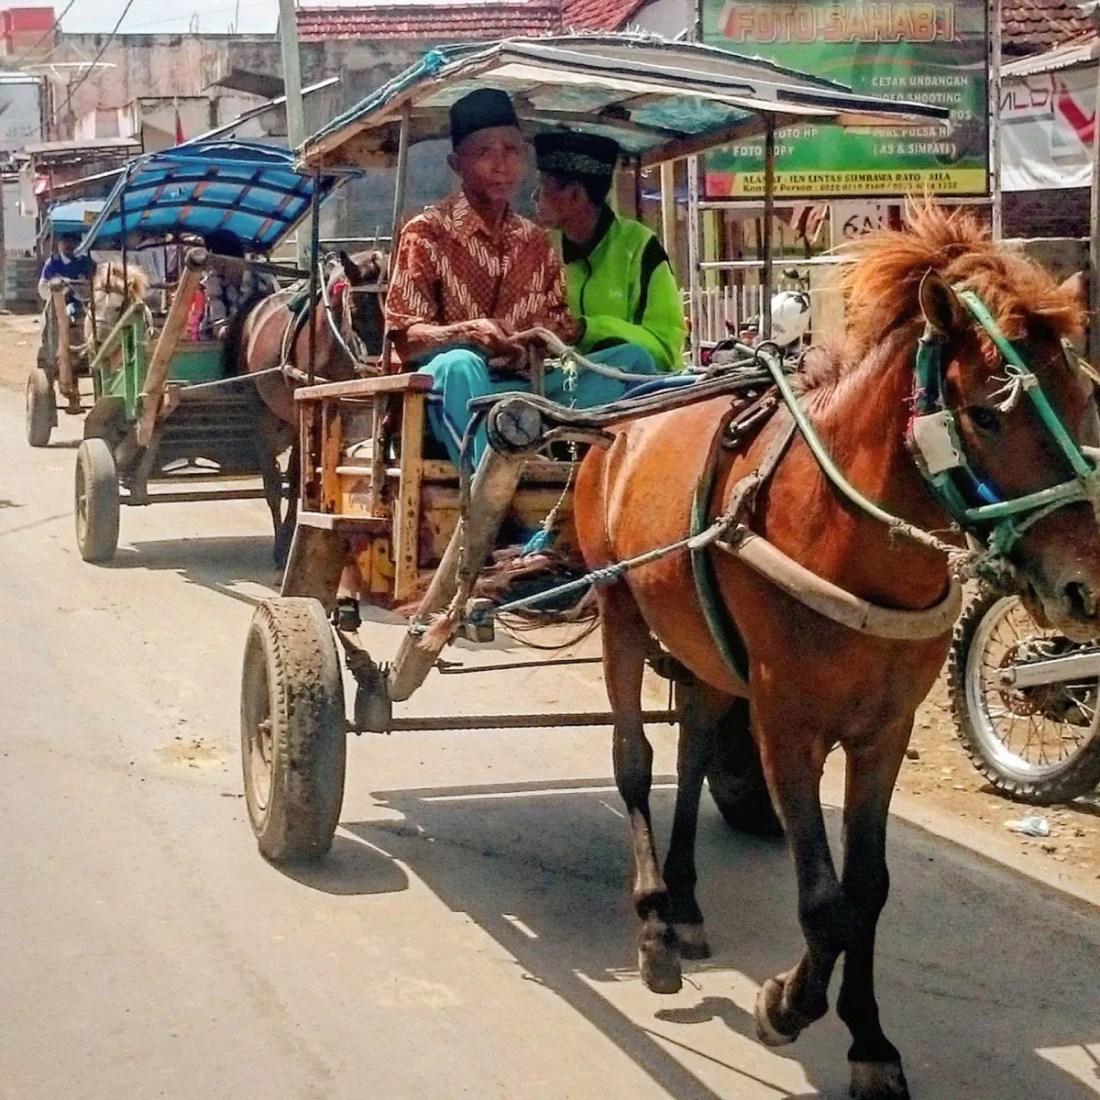 Carro en Sumbawa, Indonesia, Sudeste Asiatico @tiempodexplorar 2016